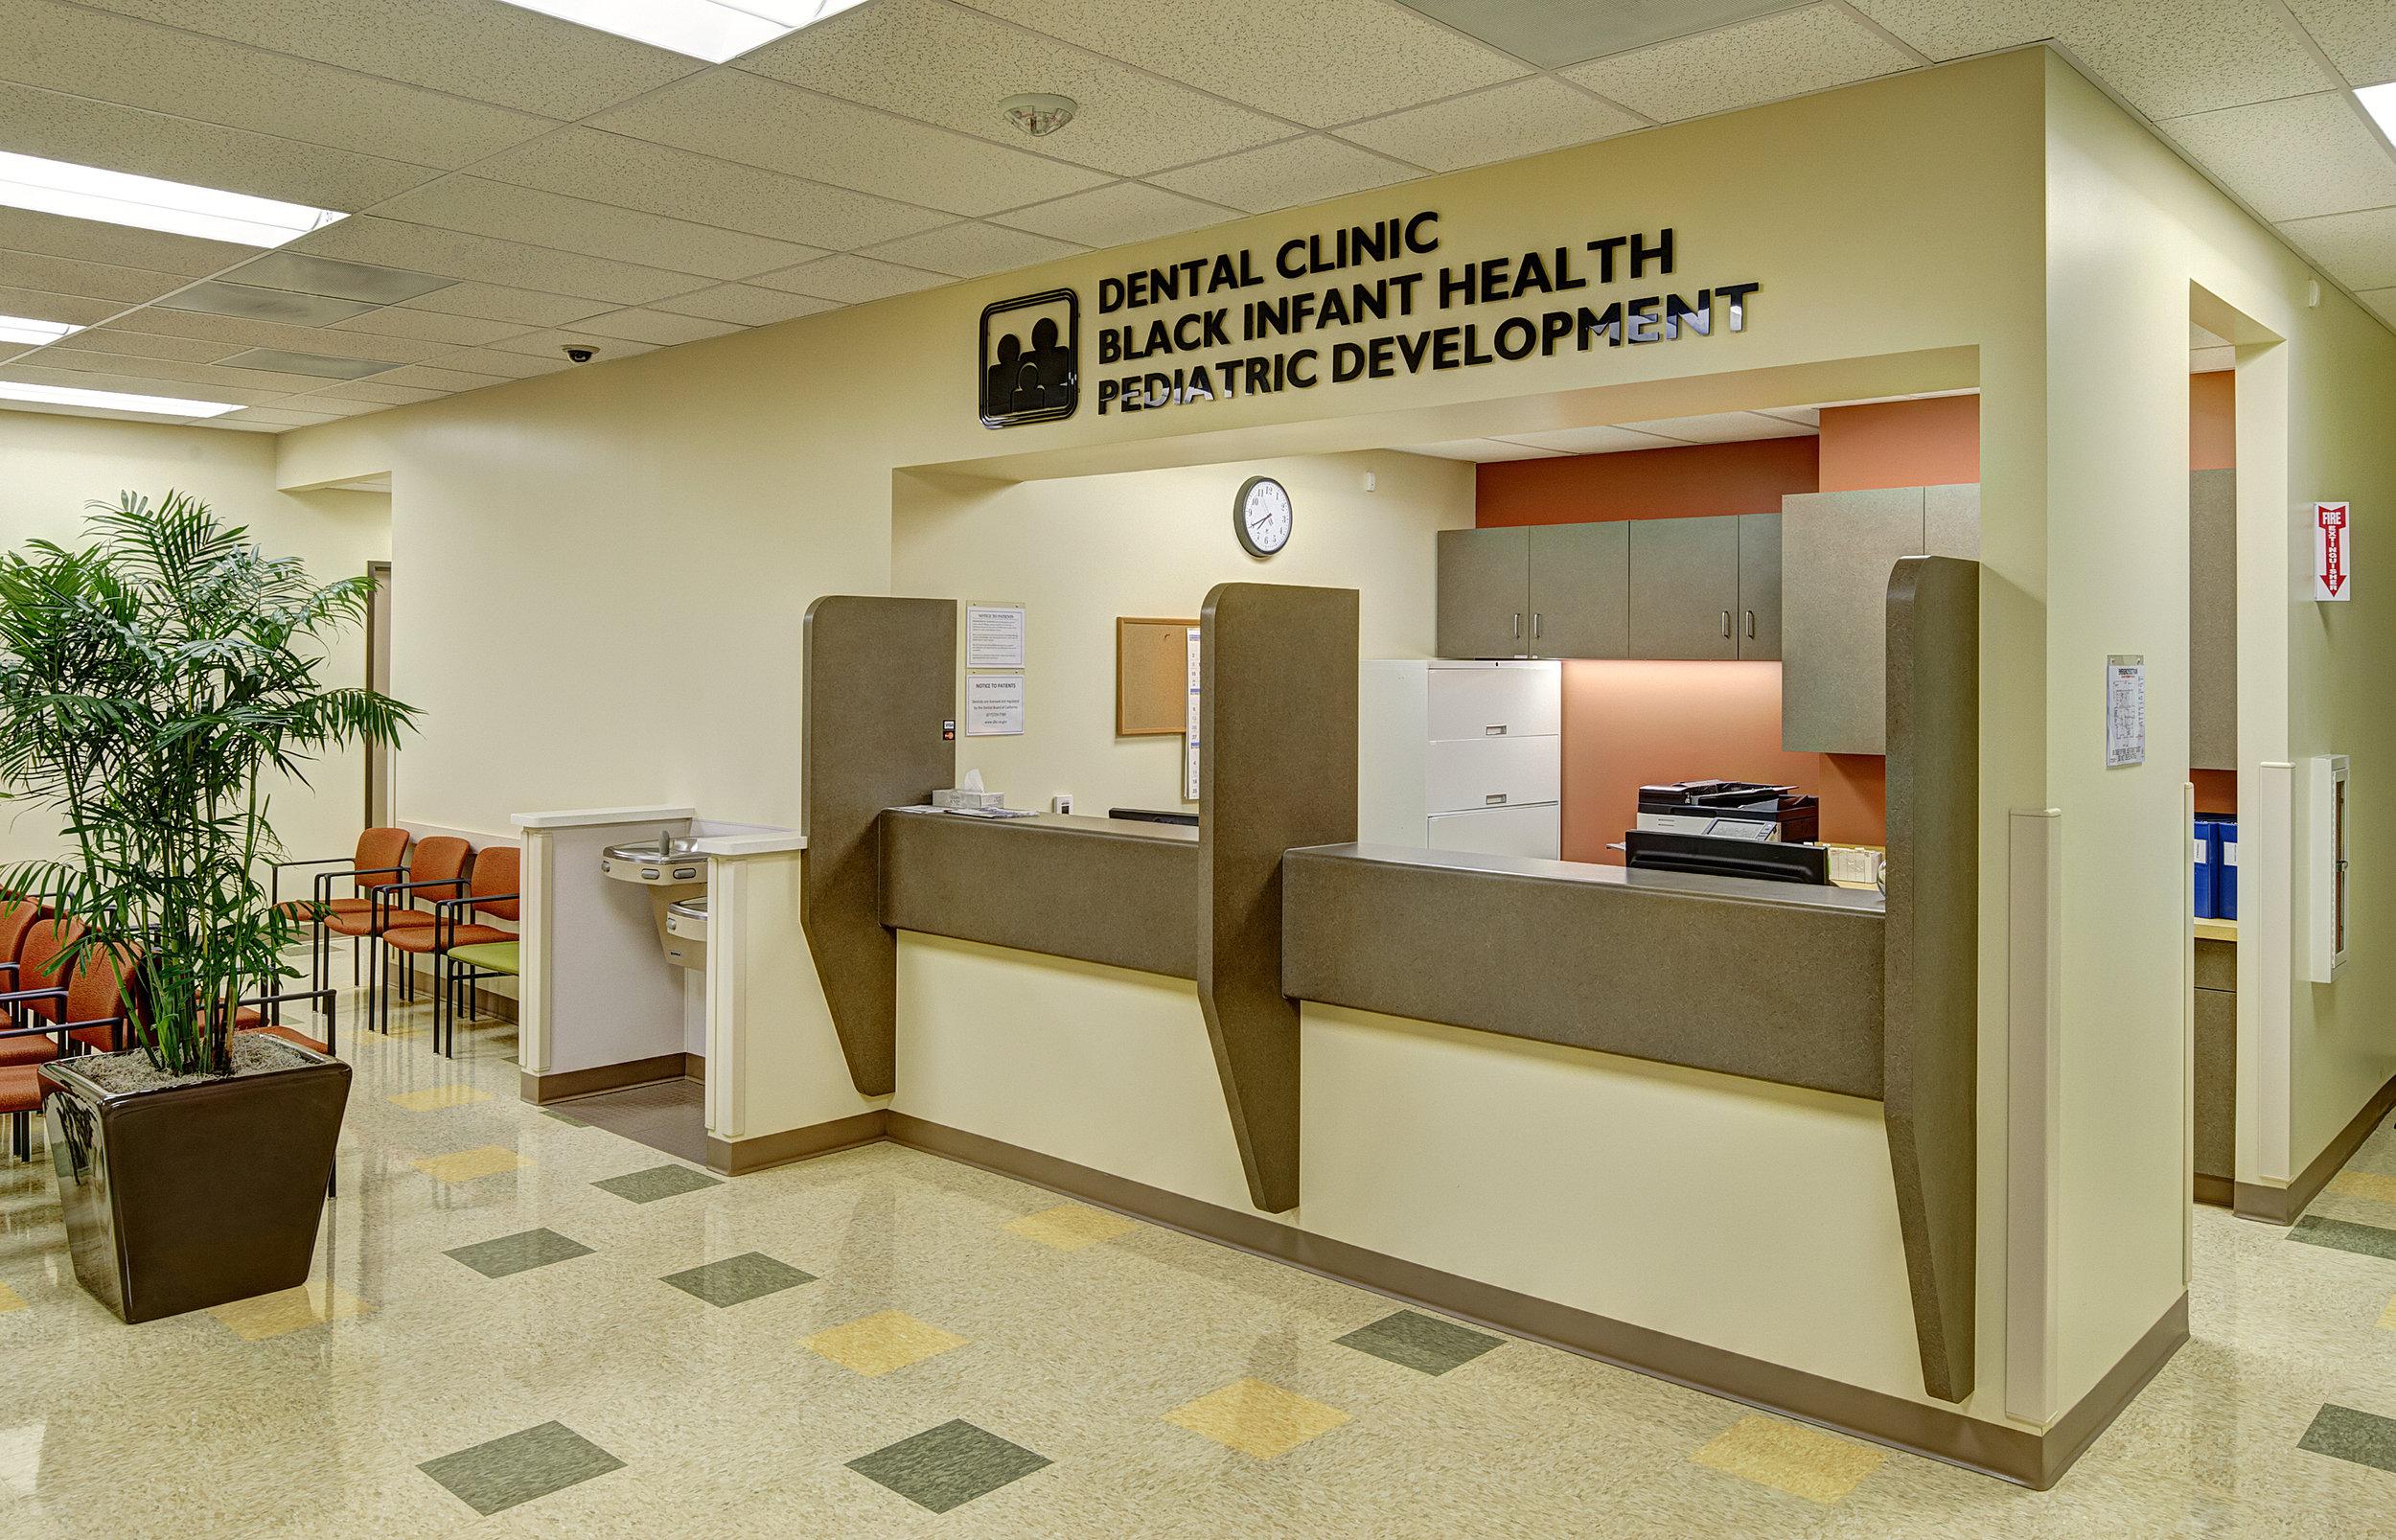 Davy_Health Center_9253.jpg